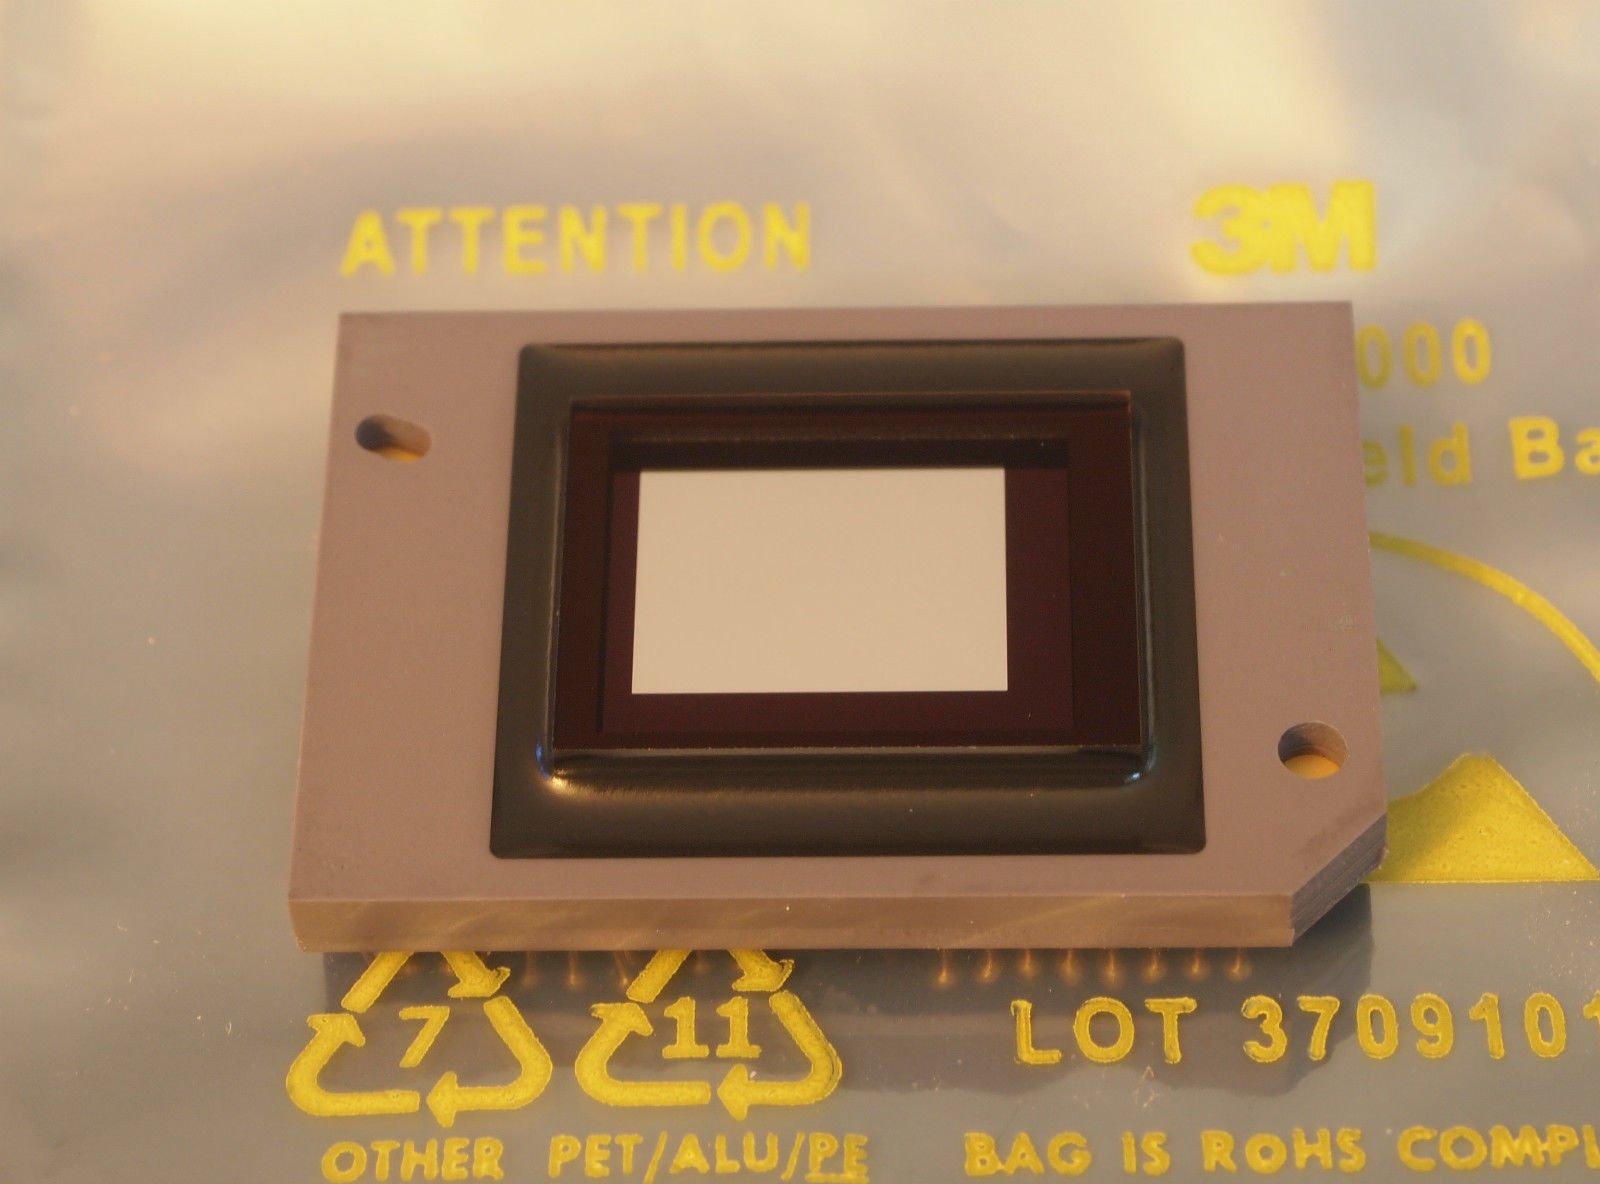 High Quality DLP Projector DMD Chip 1076-6138B 1076-6038B 1076-6039B For Benq Sanyo Sharp Viewsonic Acer Optoma Infocus Samsung LG Nec